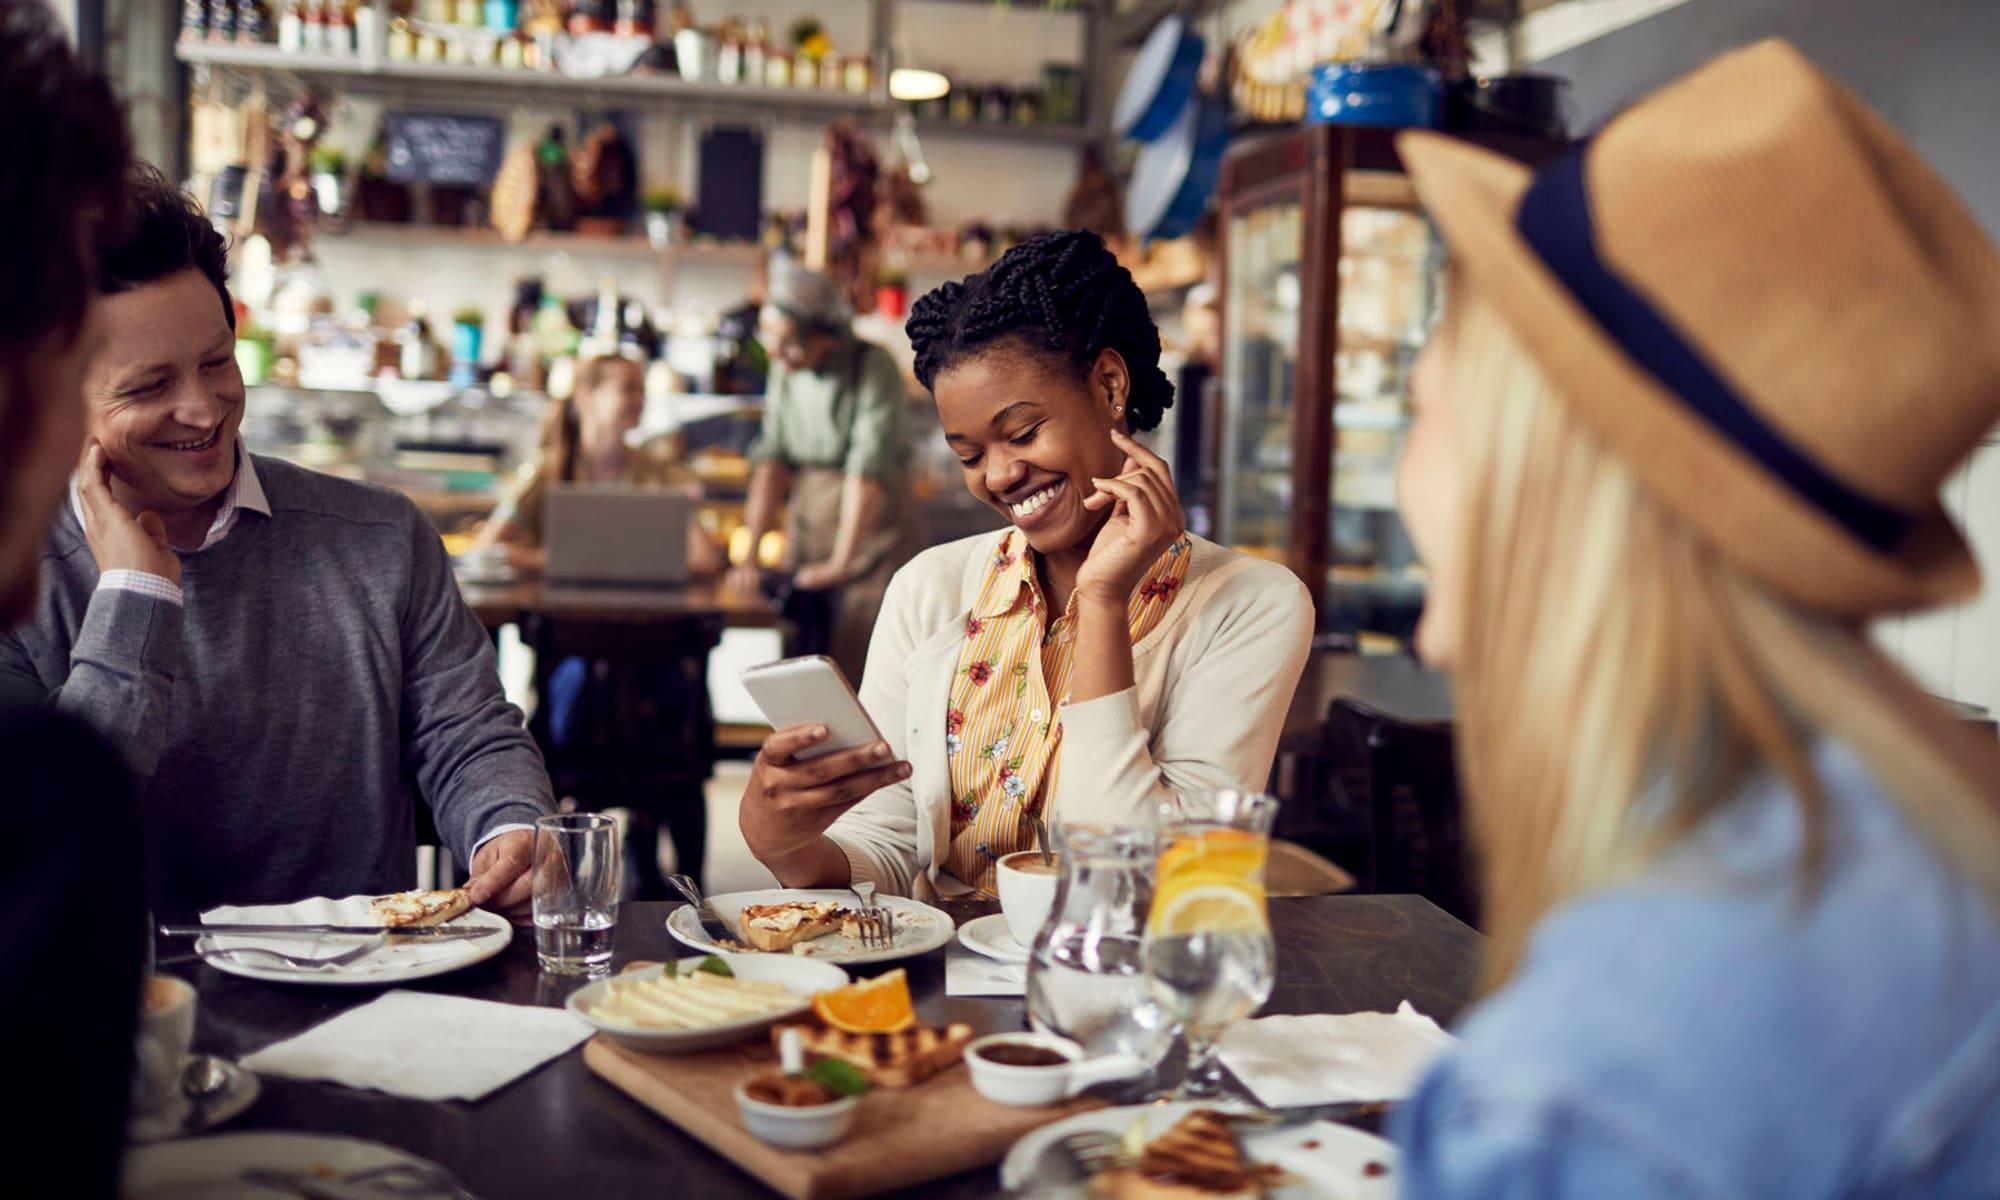 Residents meeting for coffee and breakfast at their favorite restaurant near Sendero Huntington Beach in Huntington Beach, California